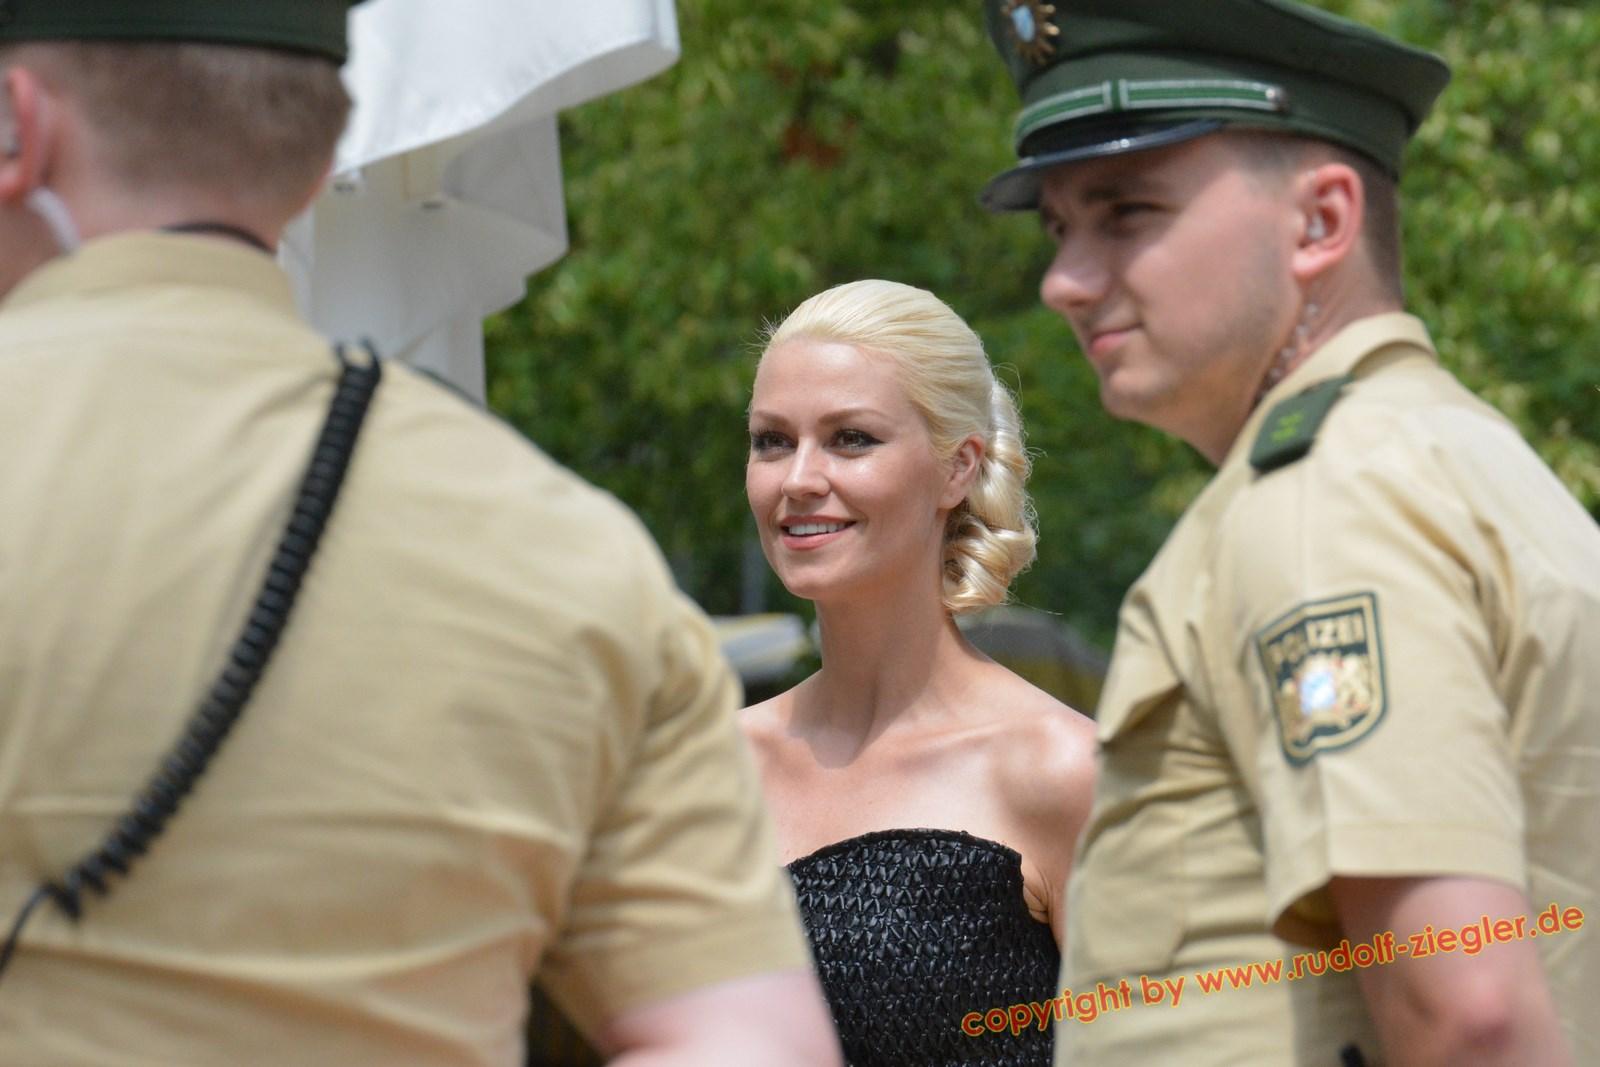 Festspiele Bayreuth - Premiere 012-A (1600x1200)